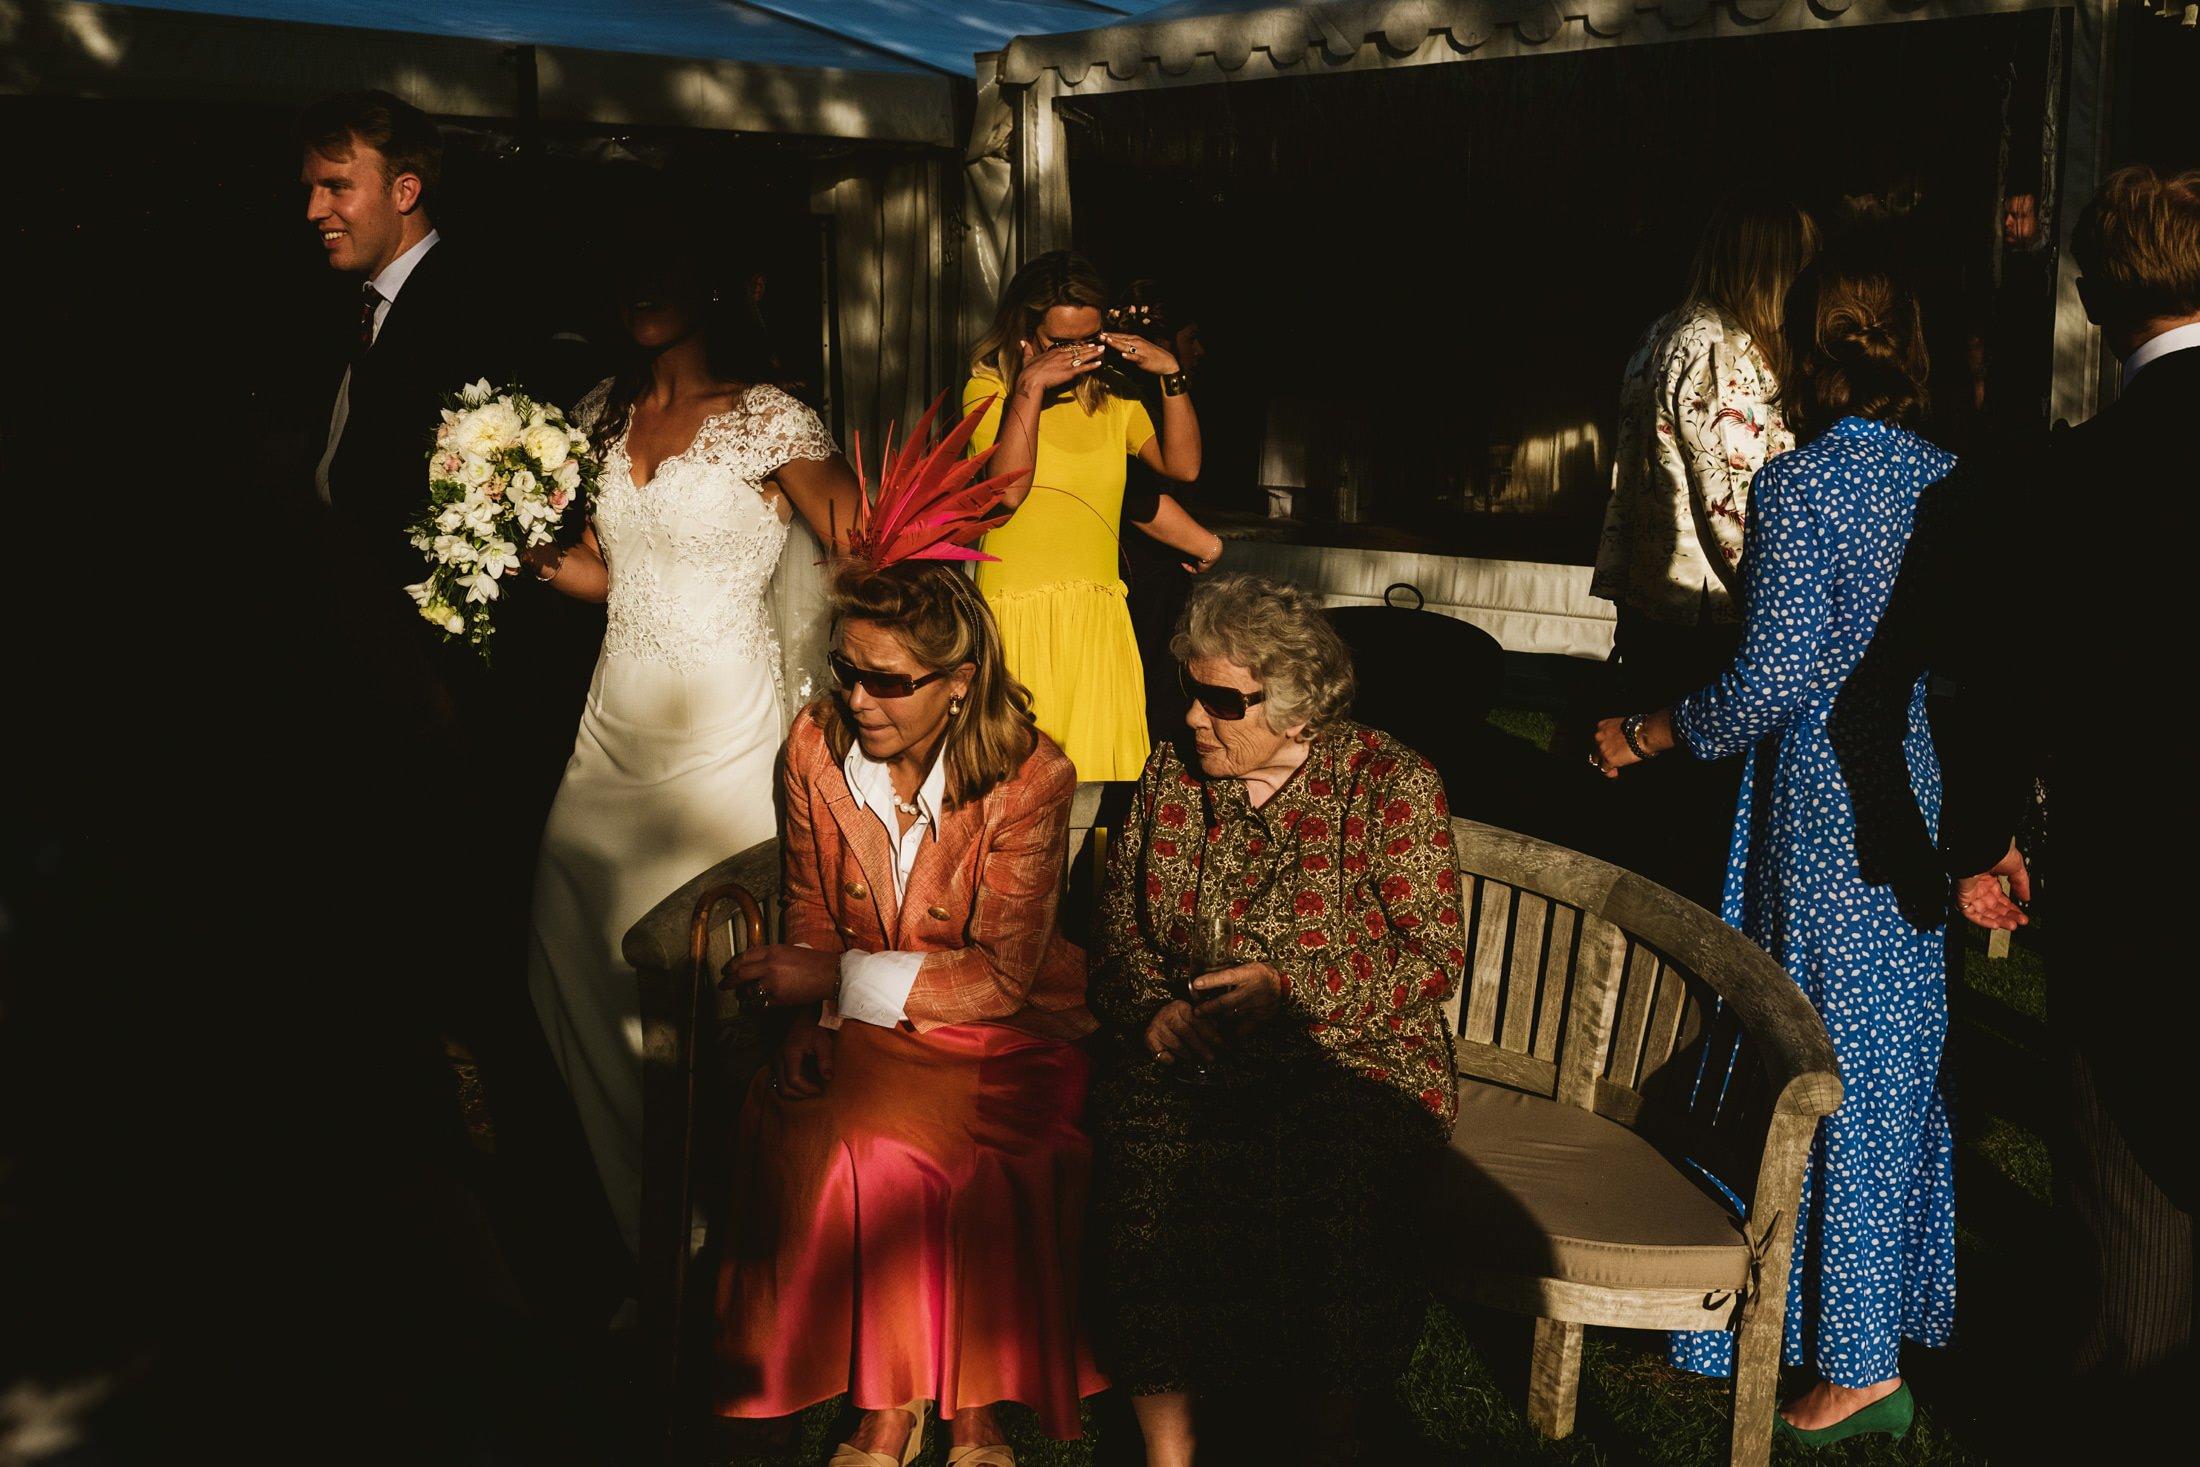 wedding reception in sunlight